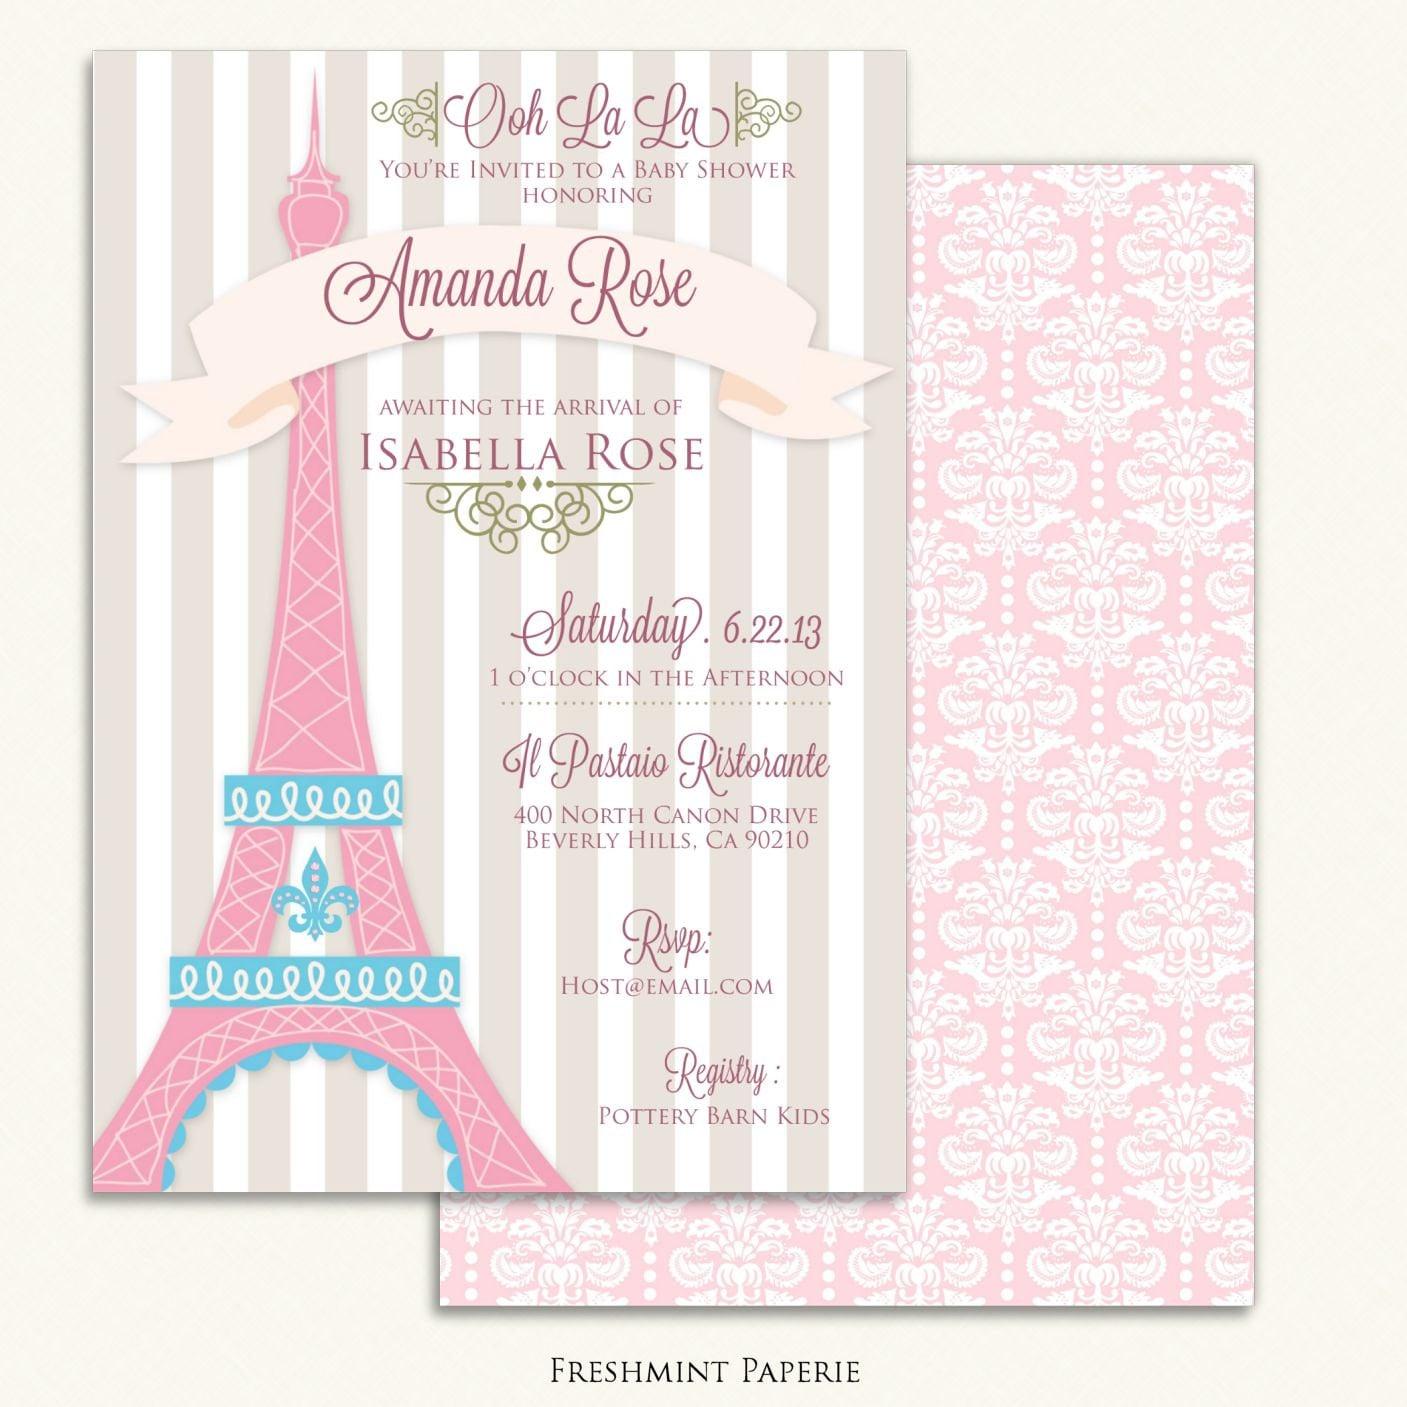 Printable invitations baby shower invitation parisian zoom stopboris Image collections